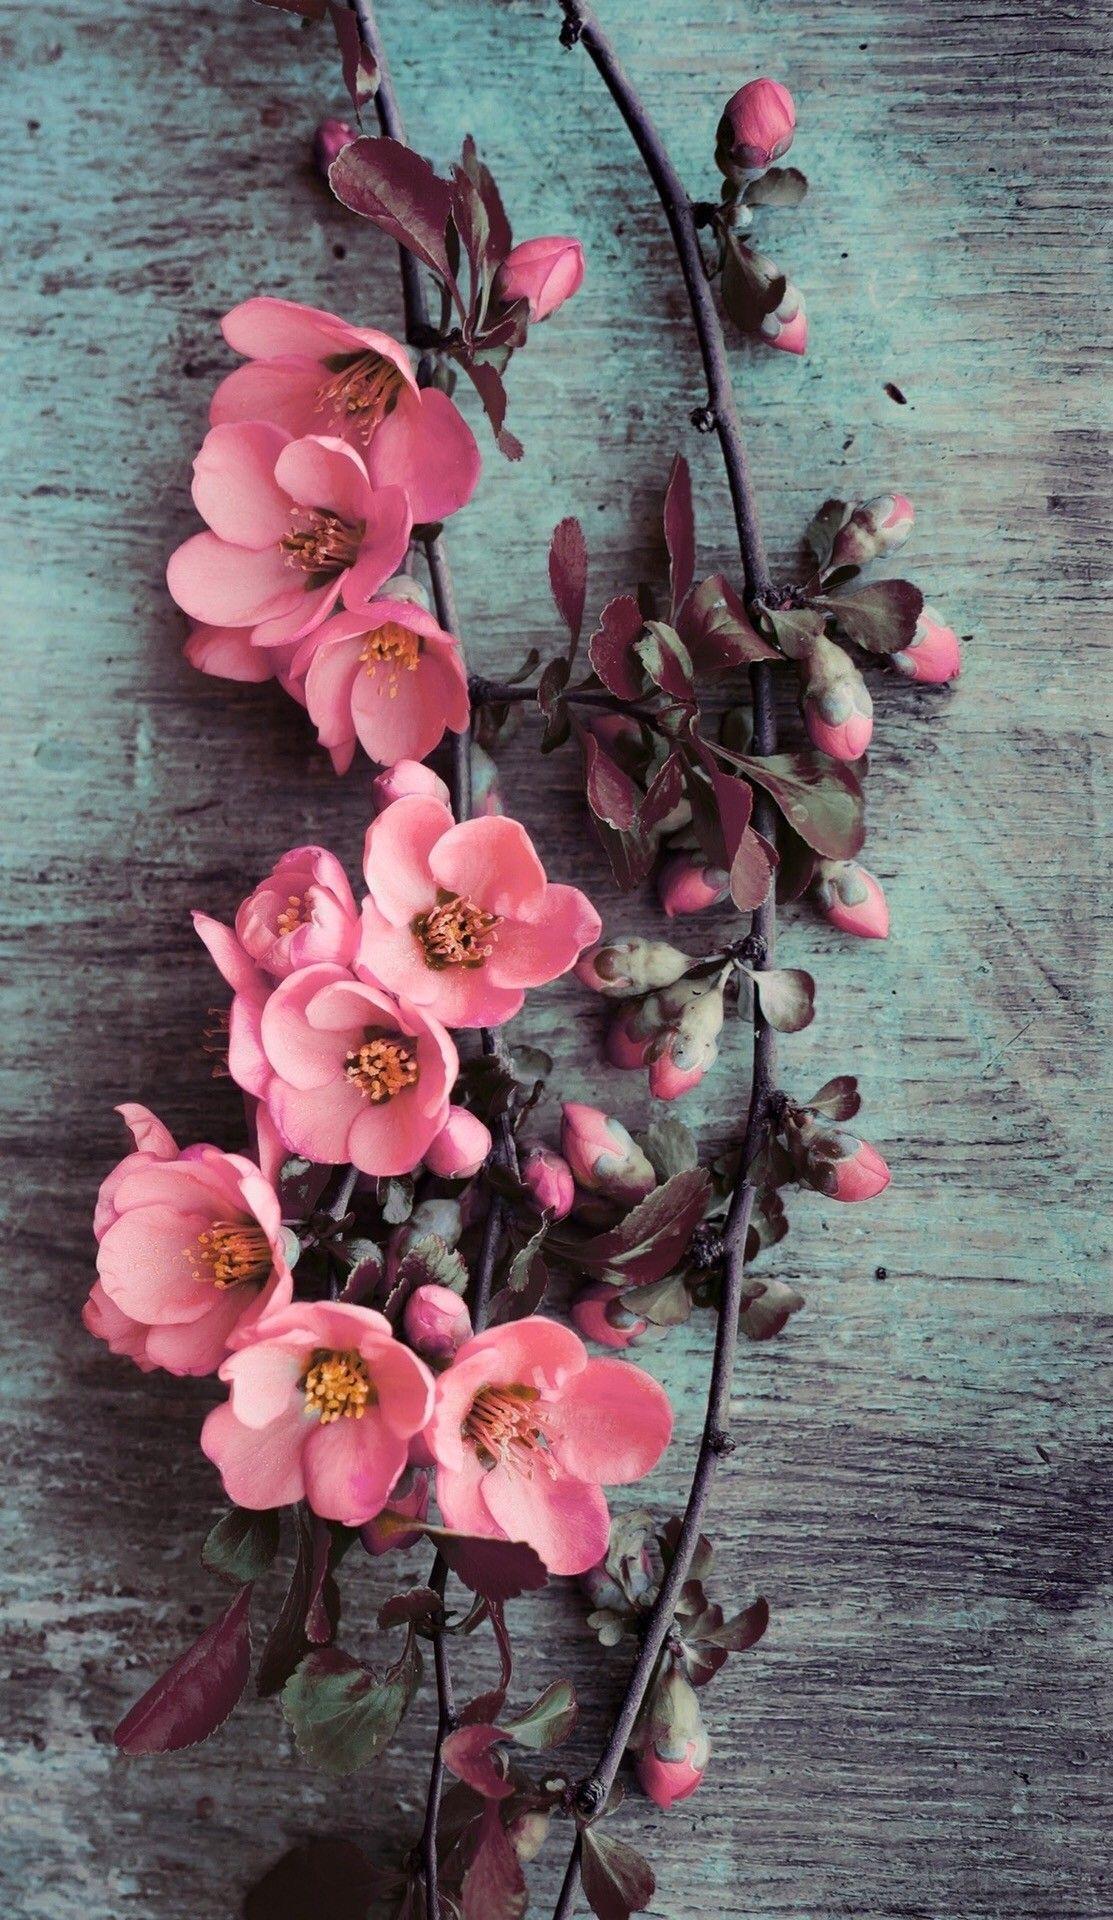 Https All Images Net Iphone Wallpaper Flowers 07 Iphone Wallpaper Flowers 07 Flower Background Iphone Beautiful Flowers Wallpapers Flower Aesthetic